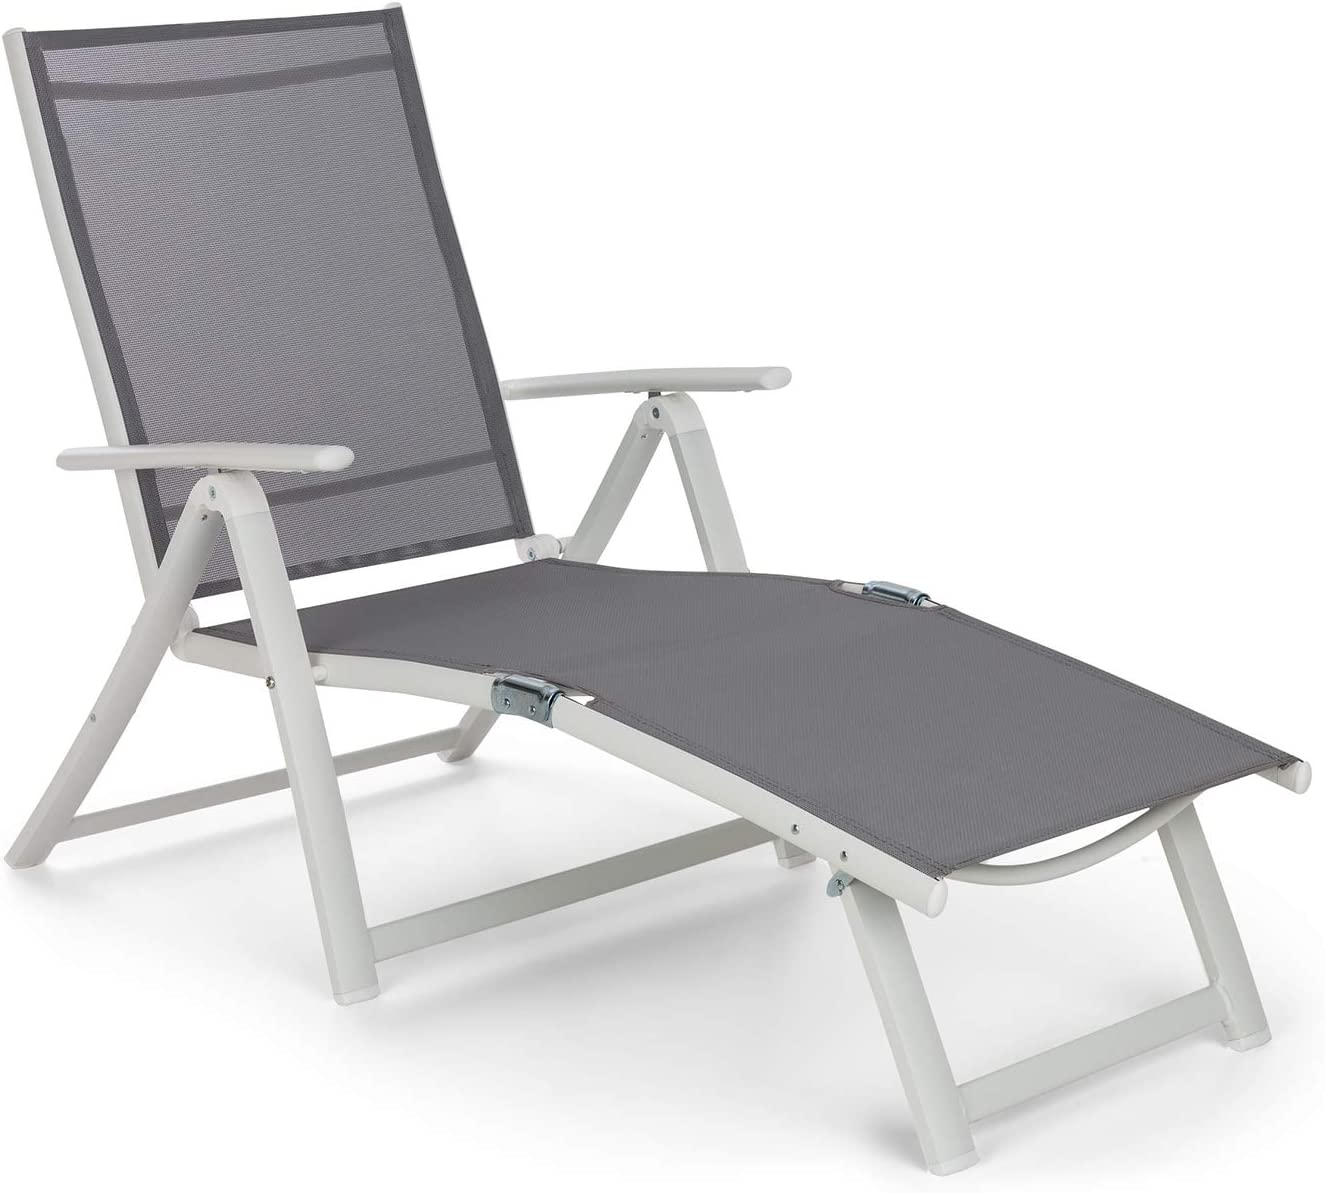 Blumfeldt Pomporto Lounge Tumbona de Exteriores - Hamaca para Tomar el Sol, Superficie de 173,5 x 51 cm, Respaldo reclinable a 7 Alturas, Superficie hidrófuga, ComfortMesh, Plegable, Blanco